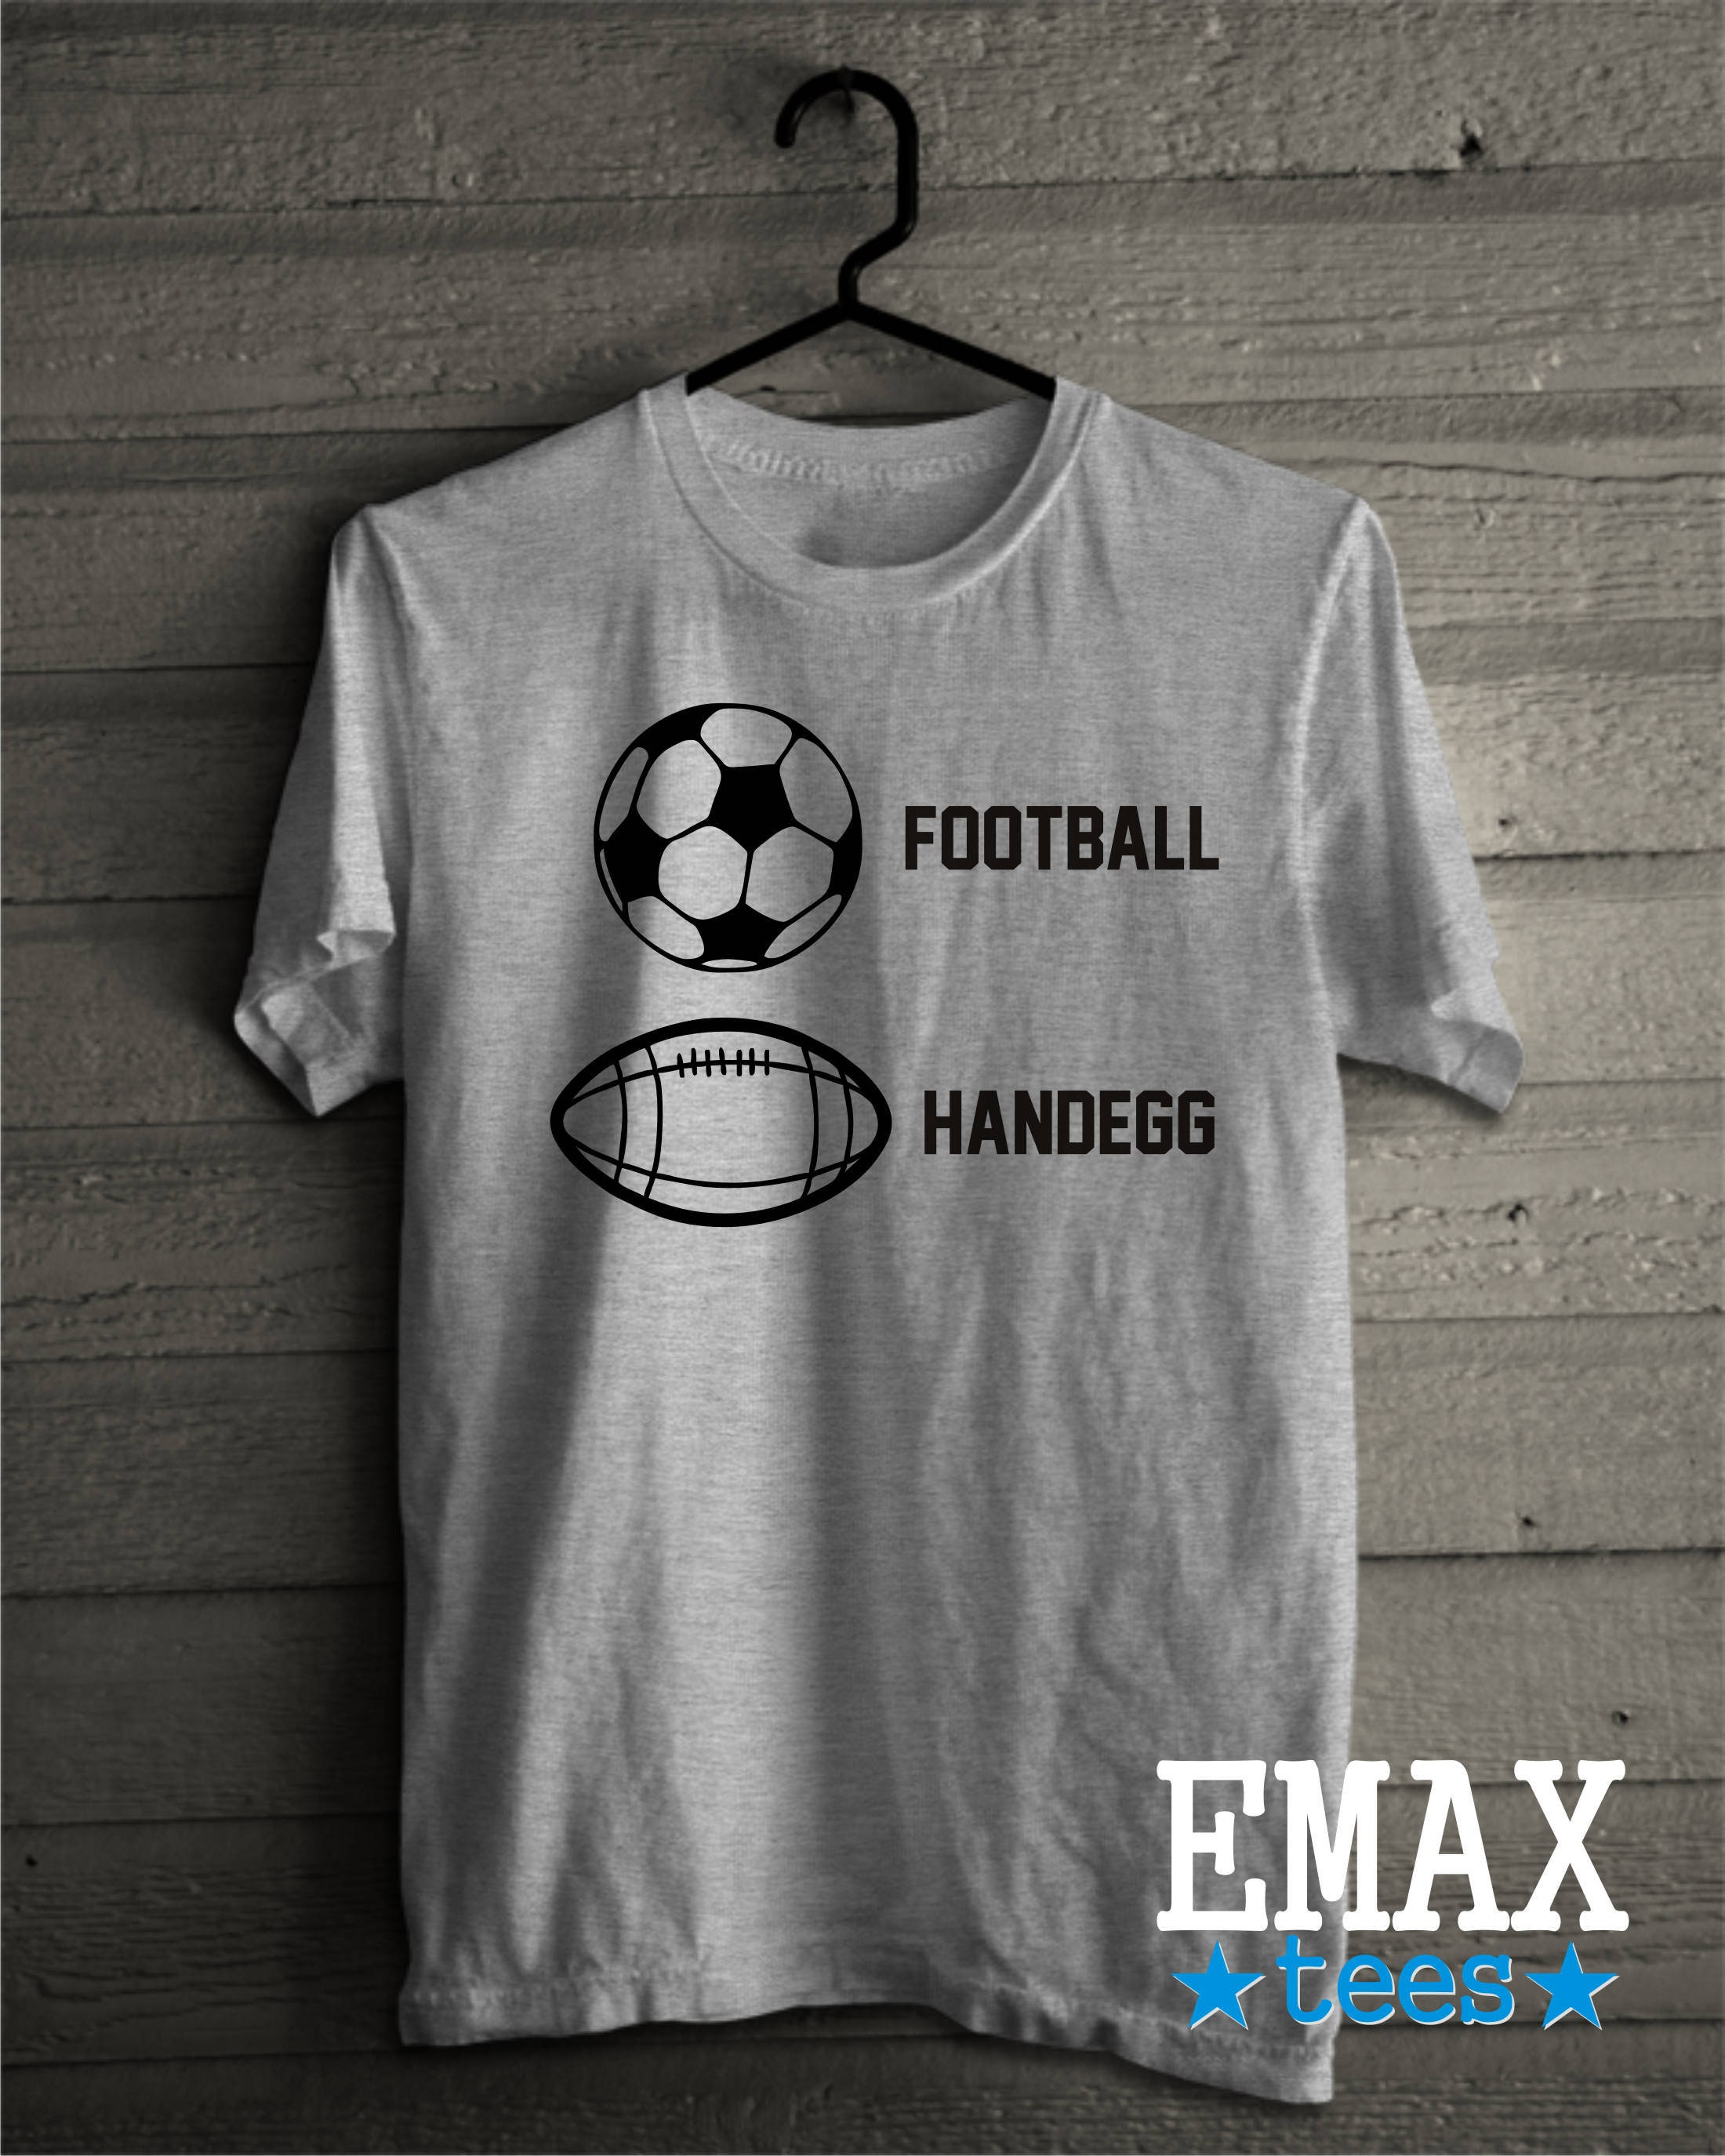 e9e7f957 Funny Soccer T Shirts Sayings